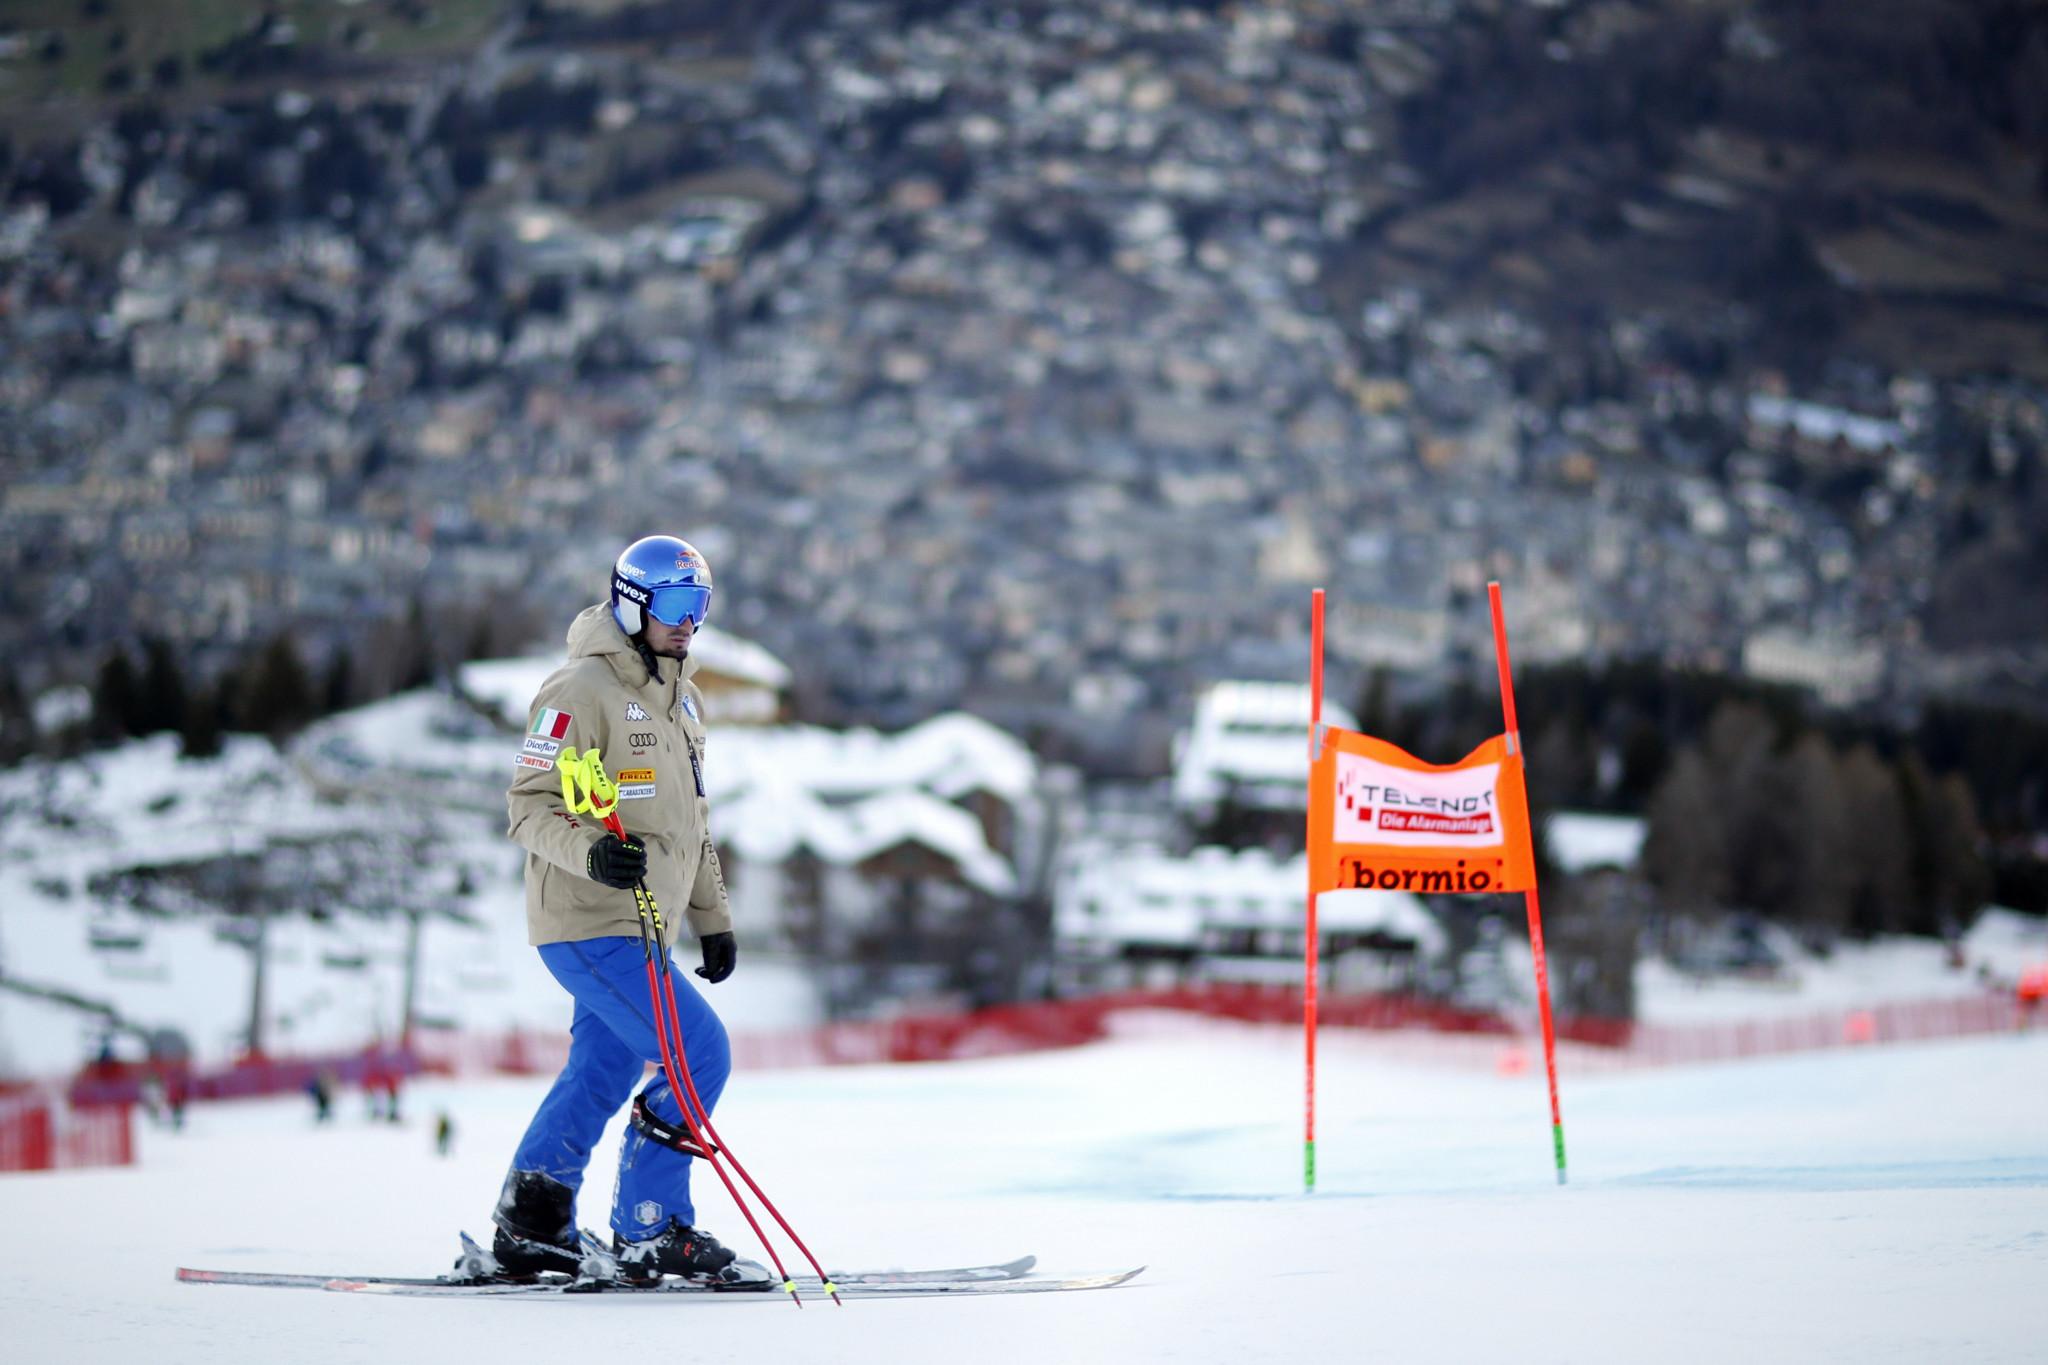 FISI President critical of Bormio's lack of progress over 2026 Winter Olympics upgrades